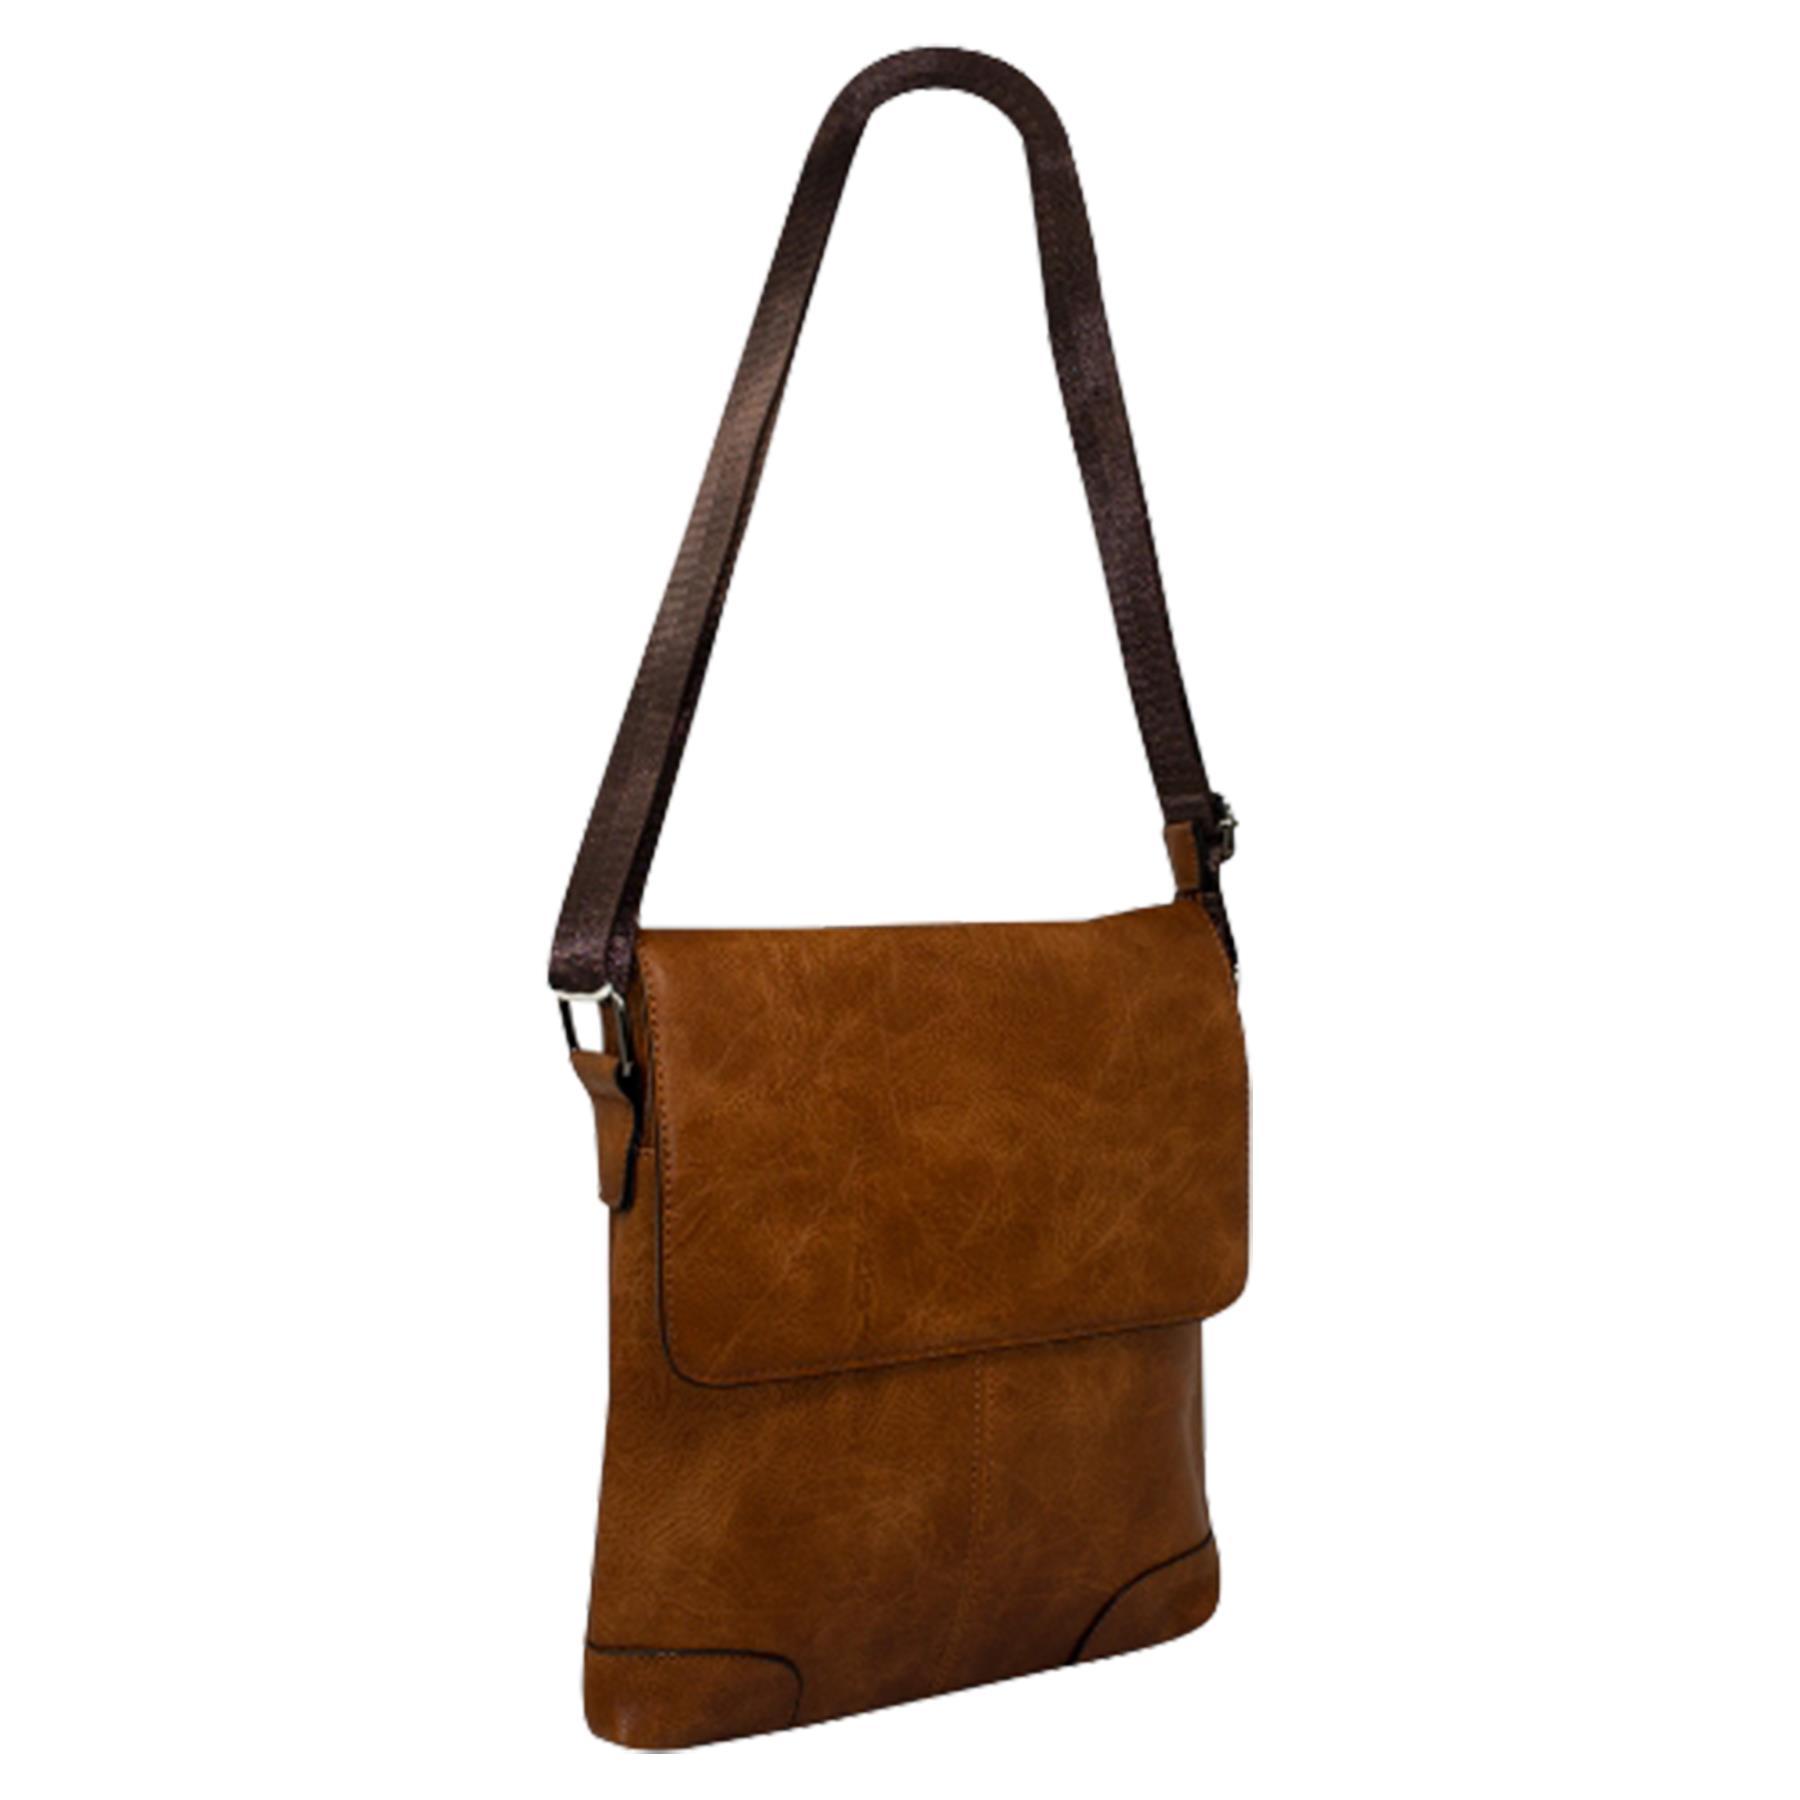 New-Plain-Faux-Leather-Men-s-Travel-Casual-Flap-Over-Messenger-Bag thumbnail 7